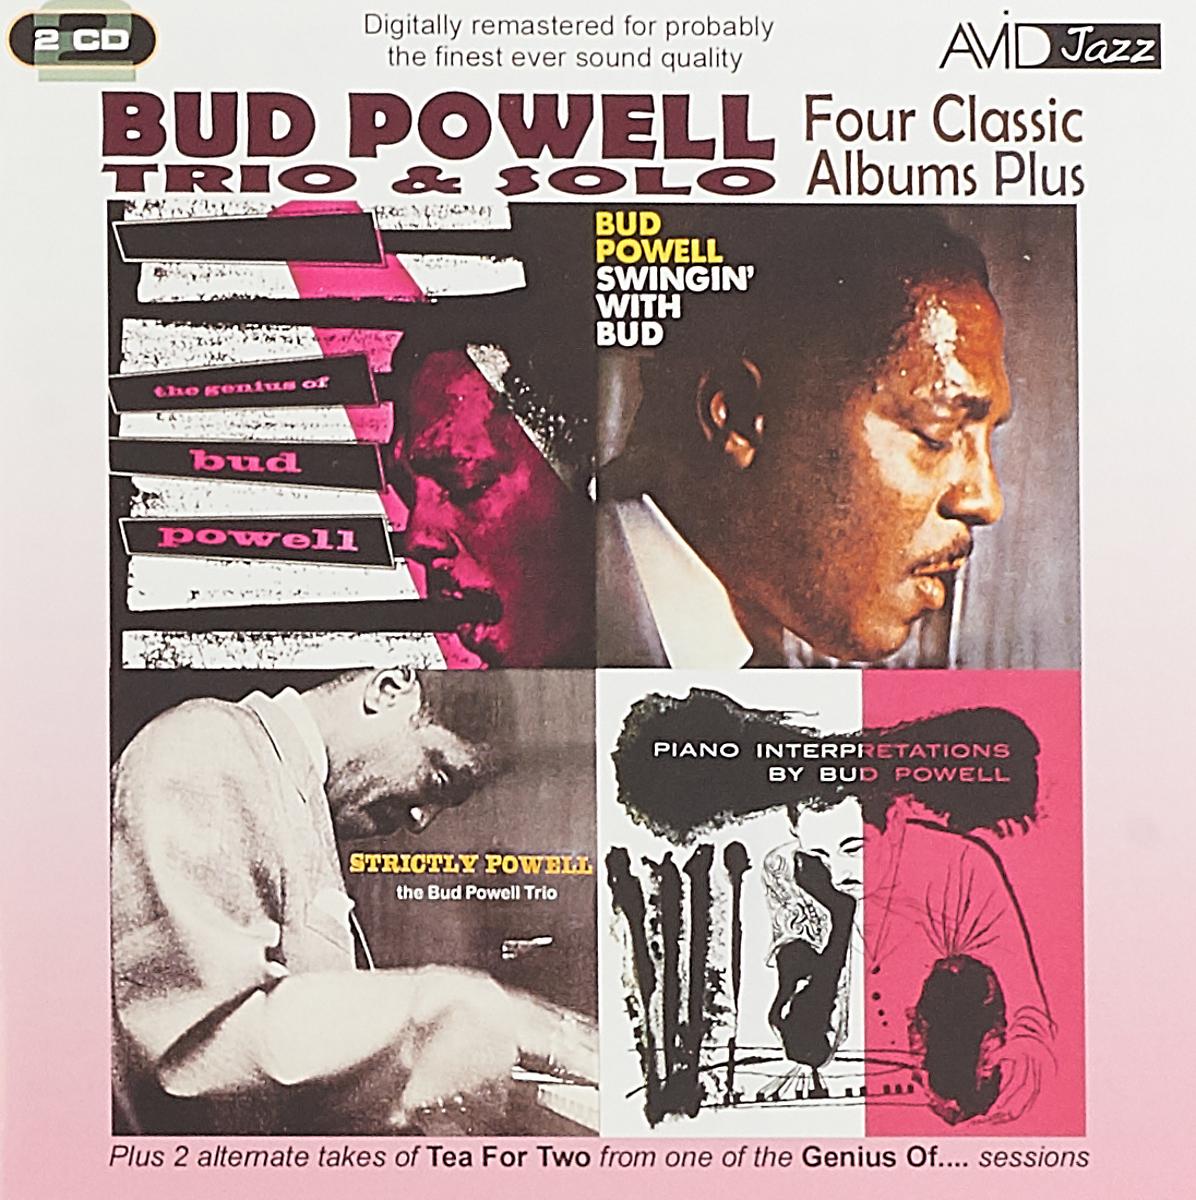 Бад Пауэлл Bud Powell. Four Classic Albums Plus (2 CD) кози пауэлл cozy powell tilt